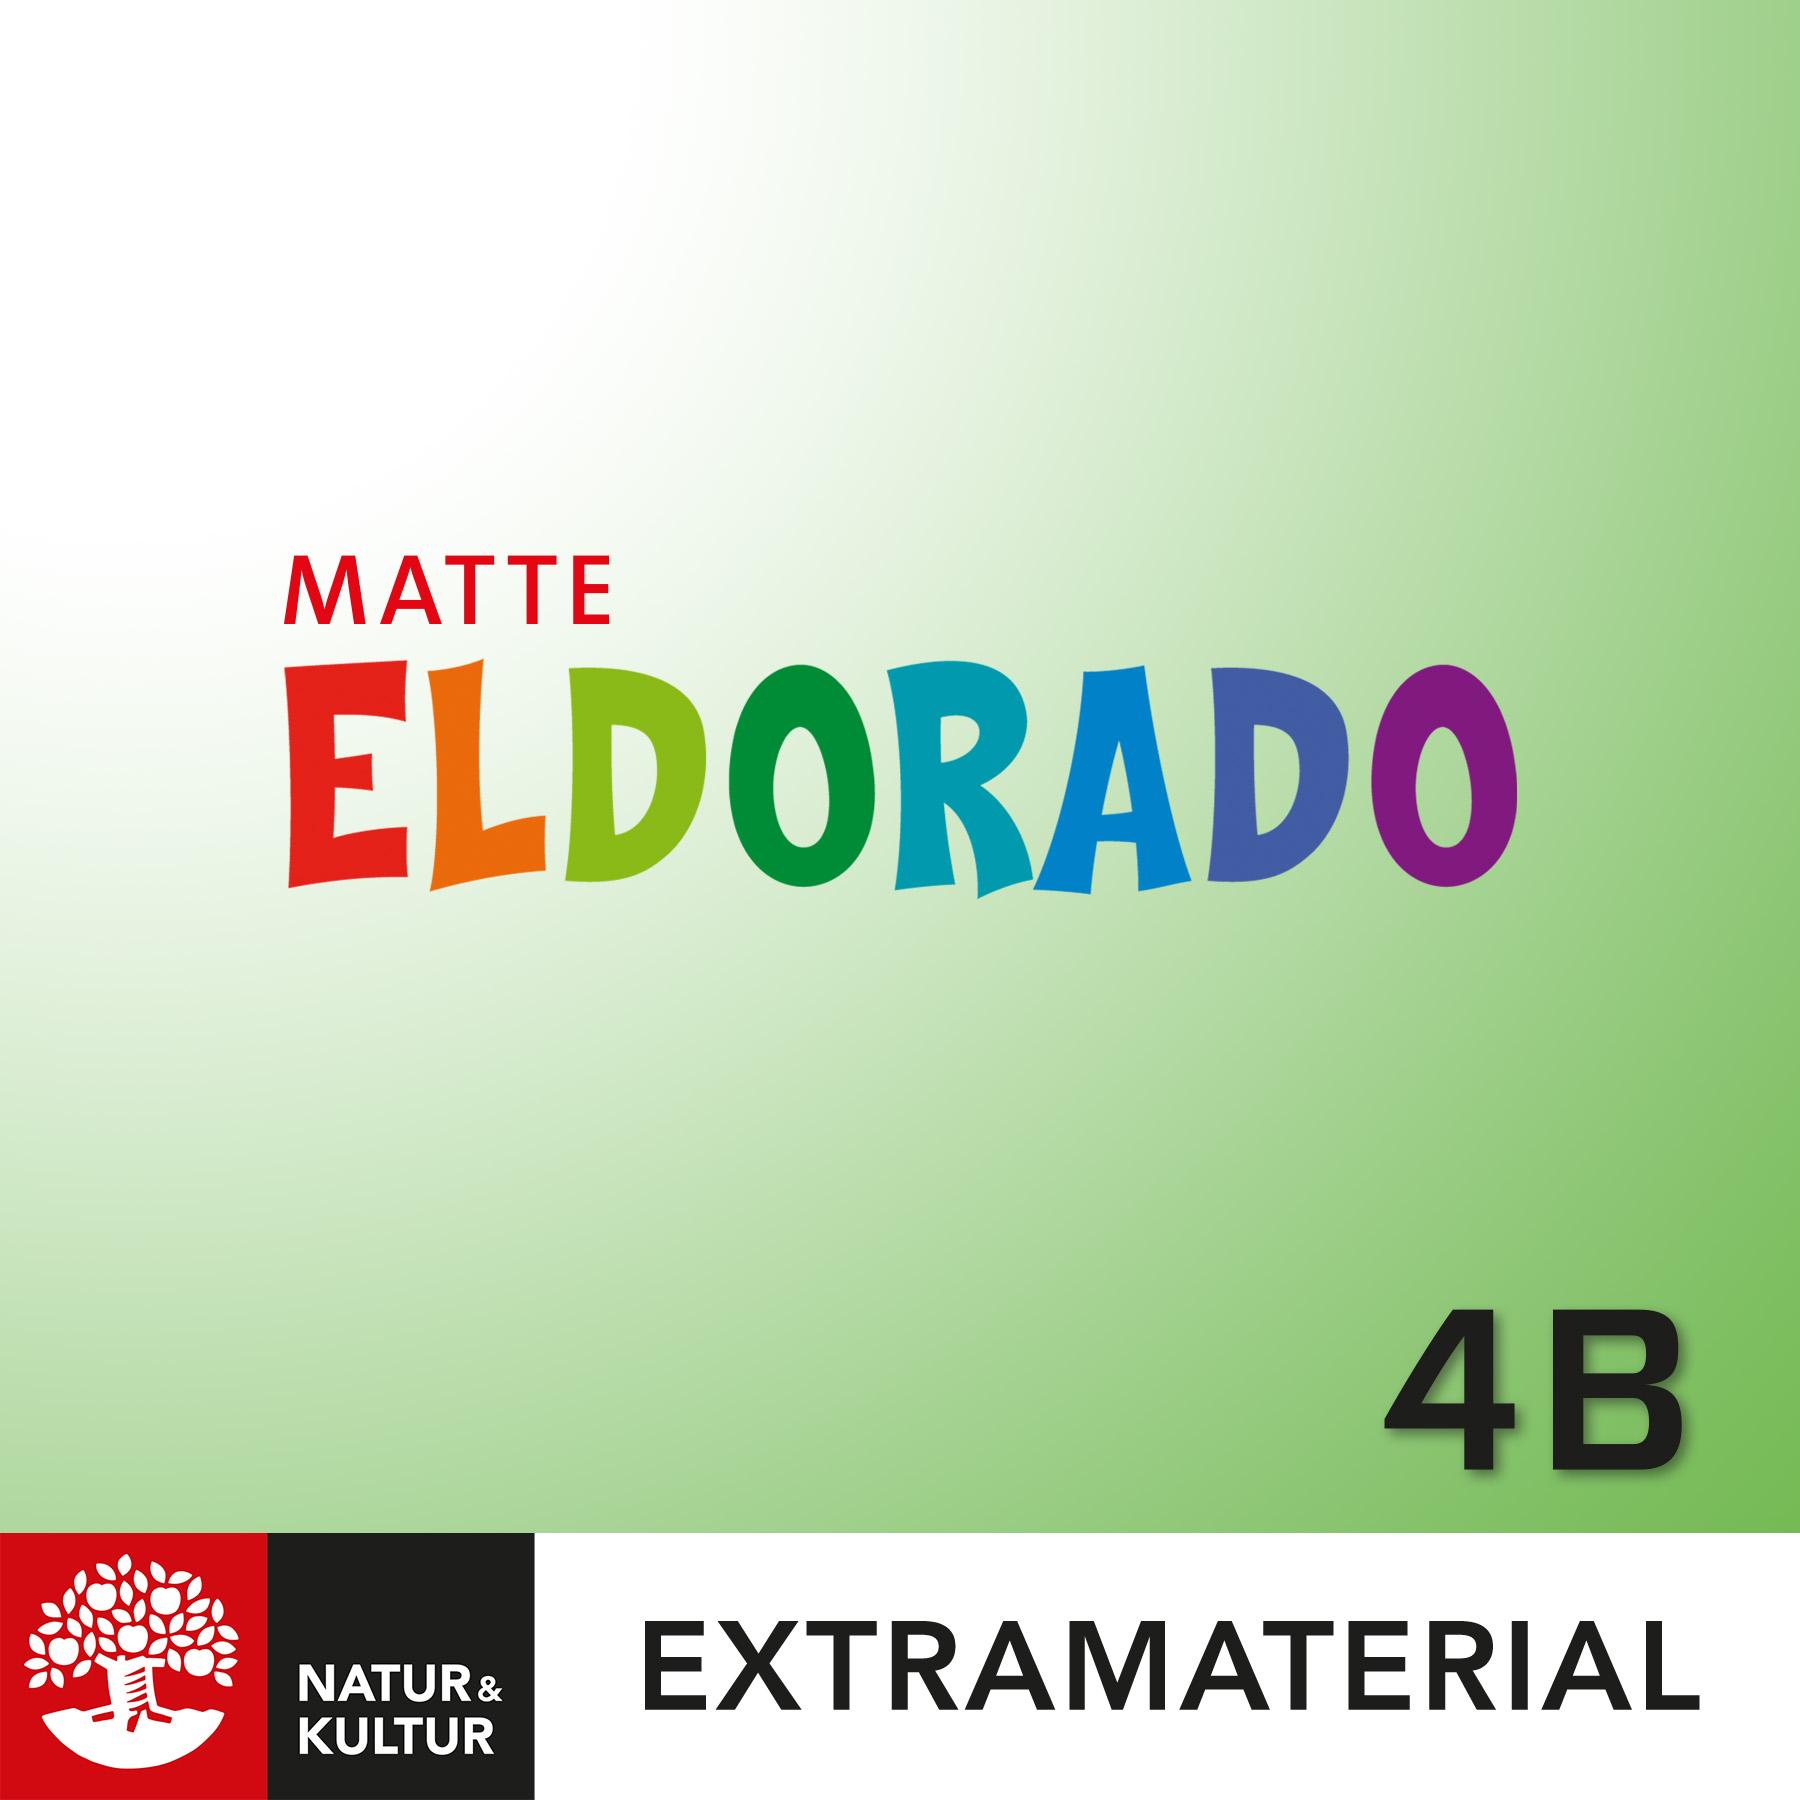 Eldorado 4B